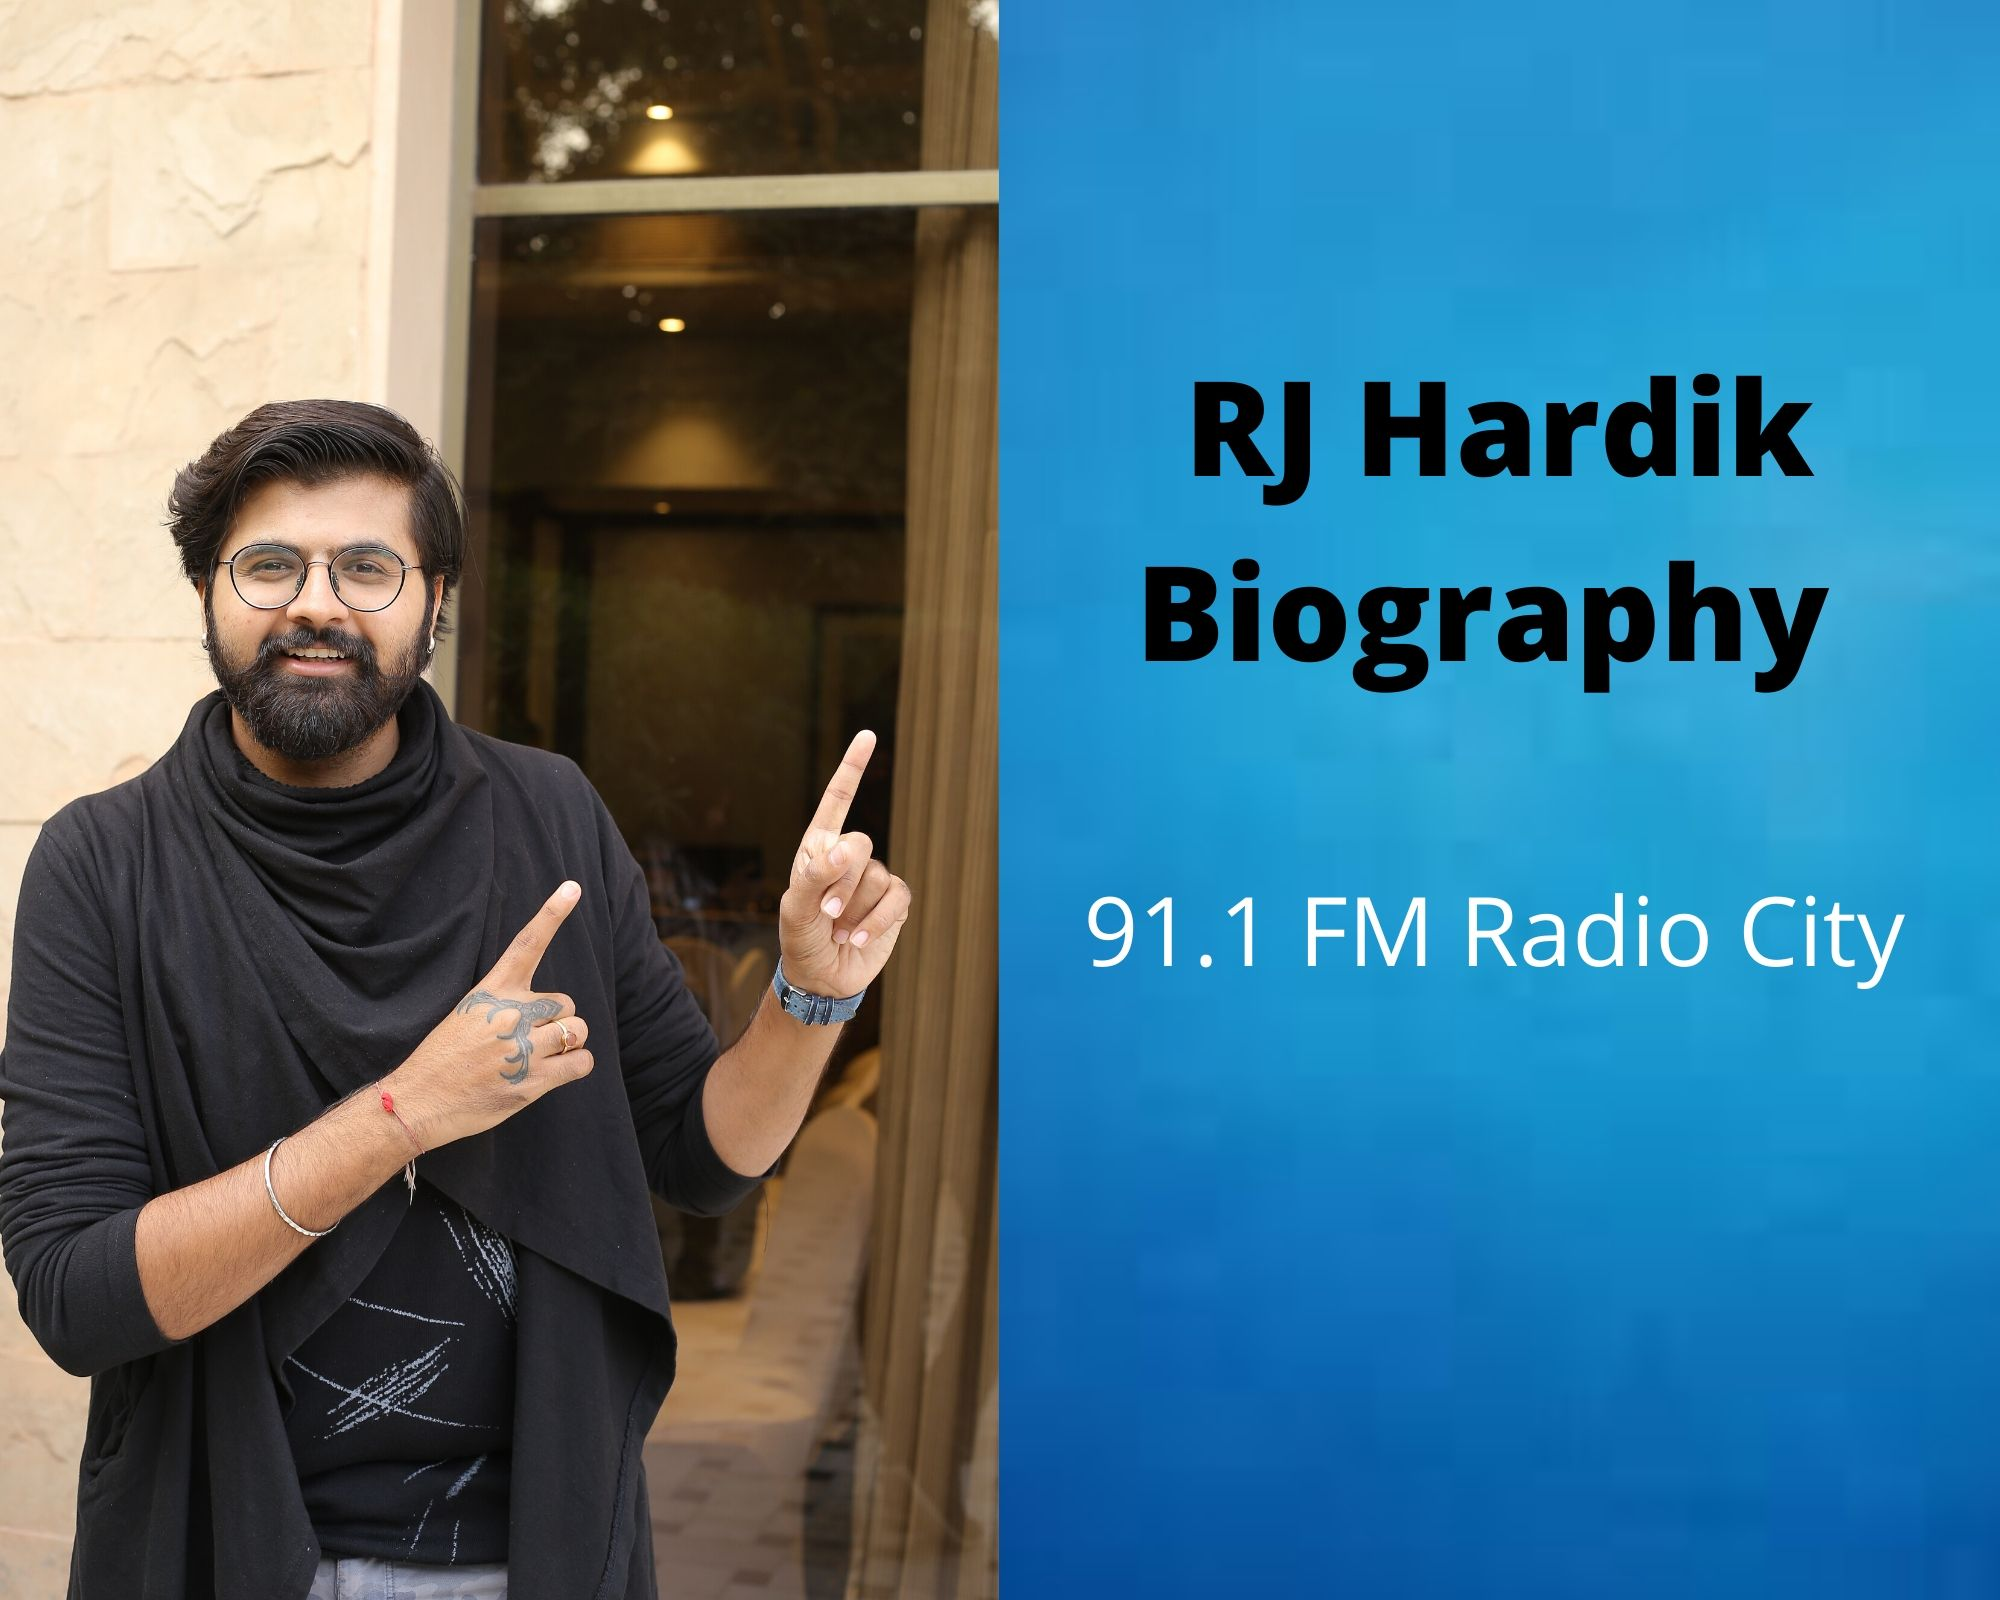 RJ Hardik Biography